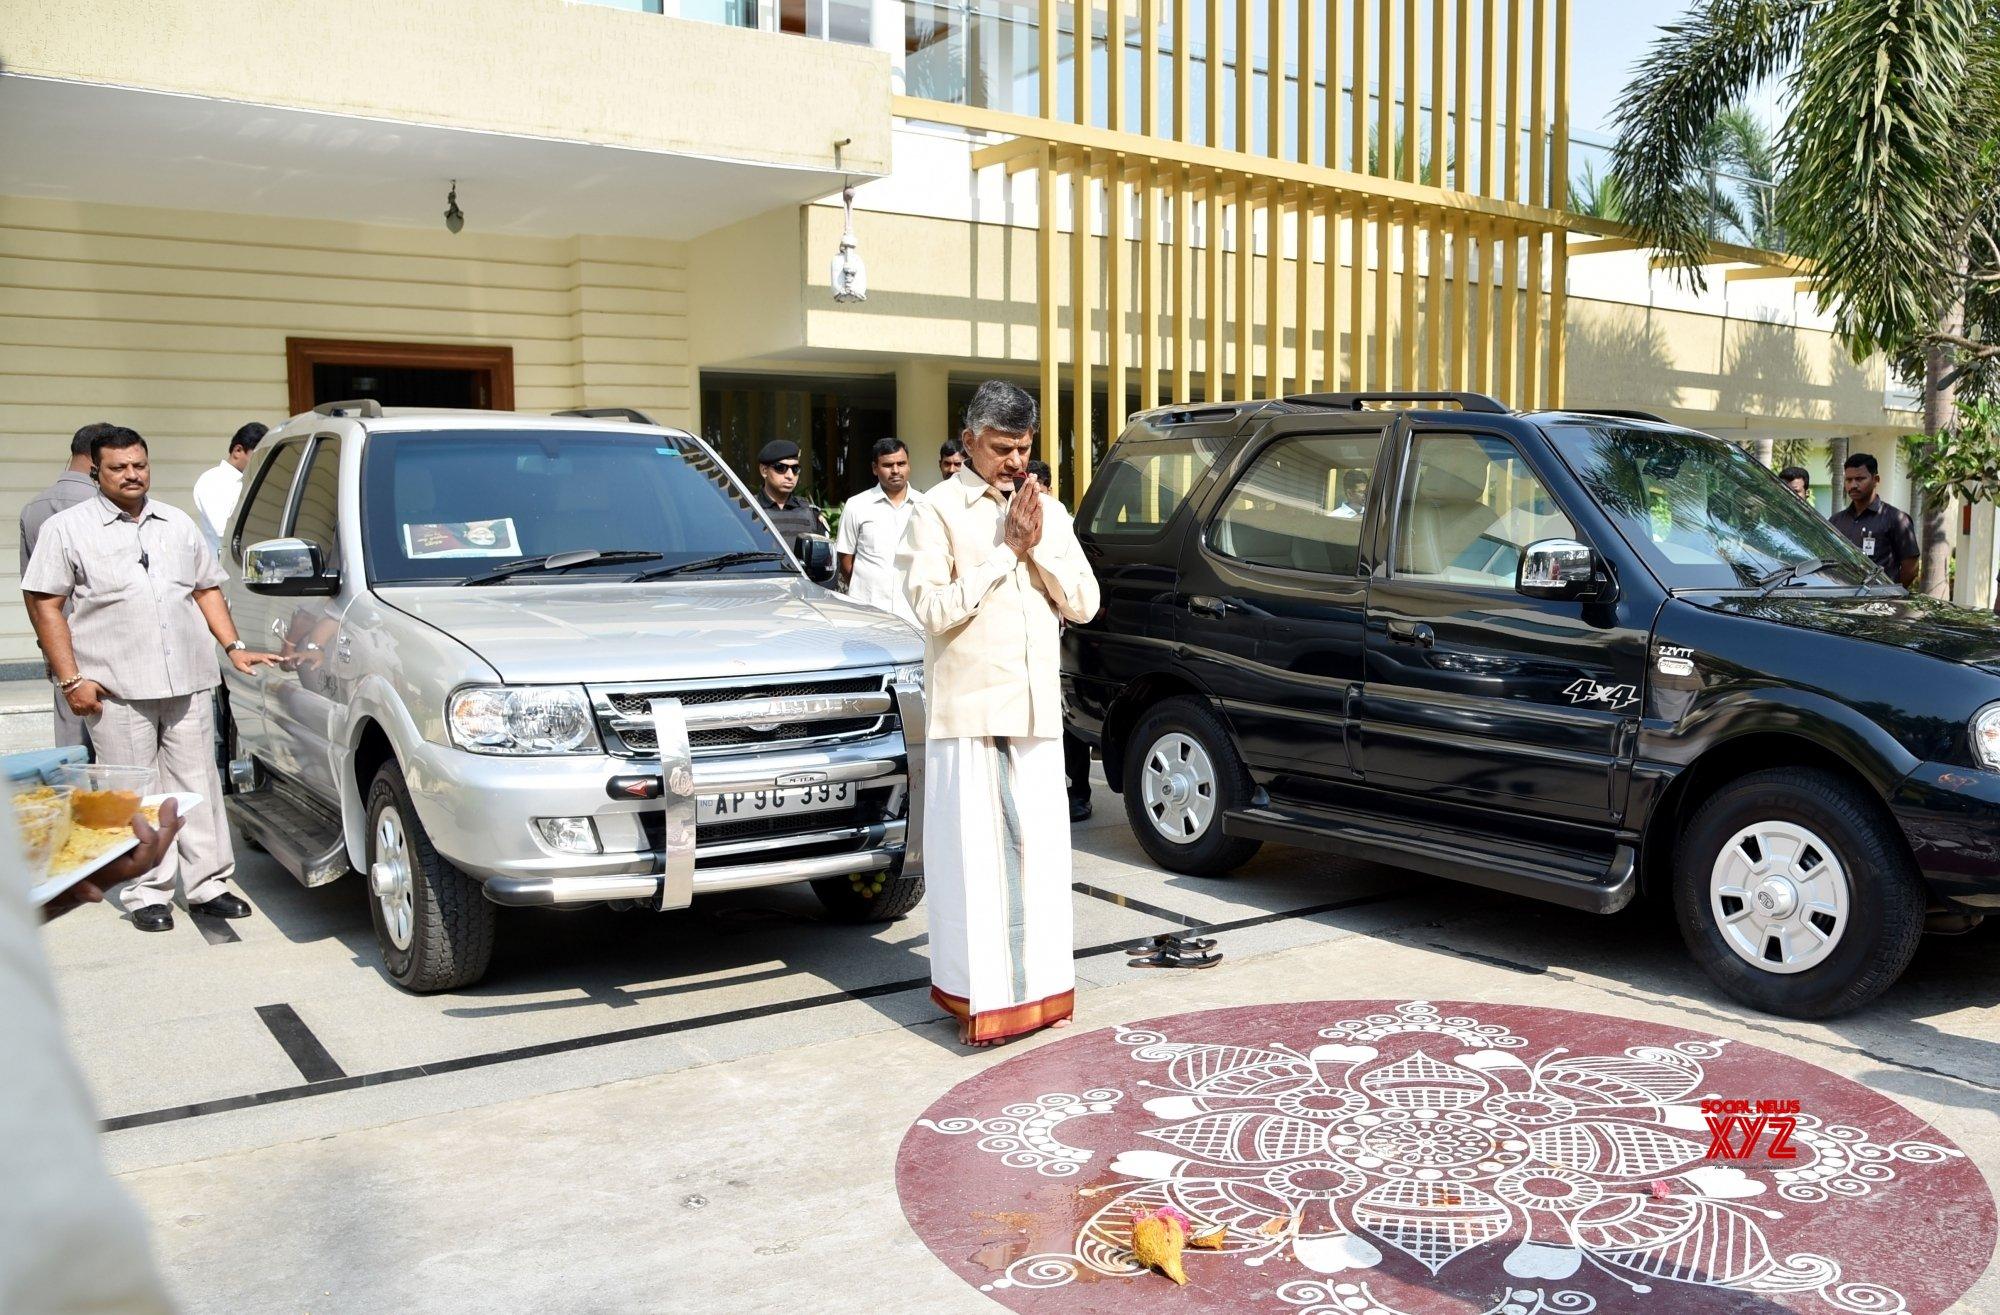 Tirupati (Andhra Pradesh): Chandrababu Naidu visits Tirupati Balaji Temple #Gallery